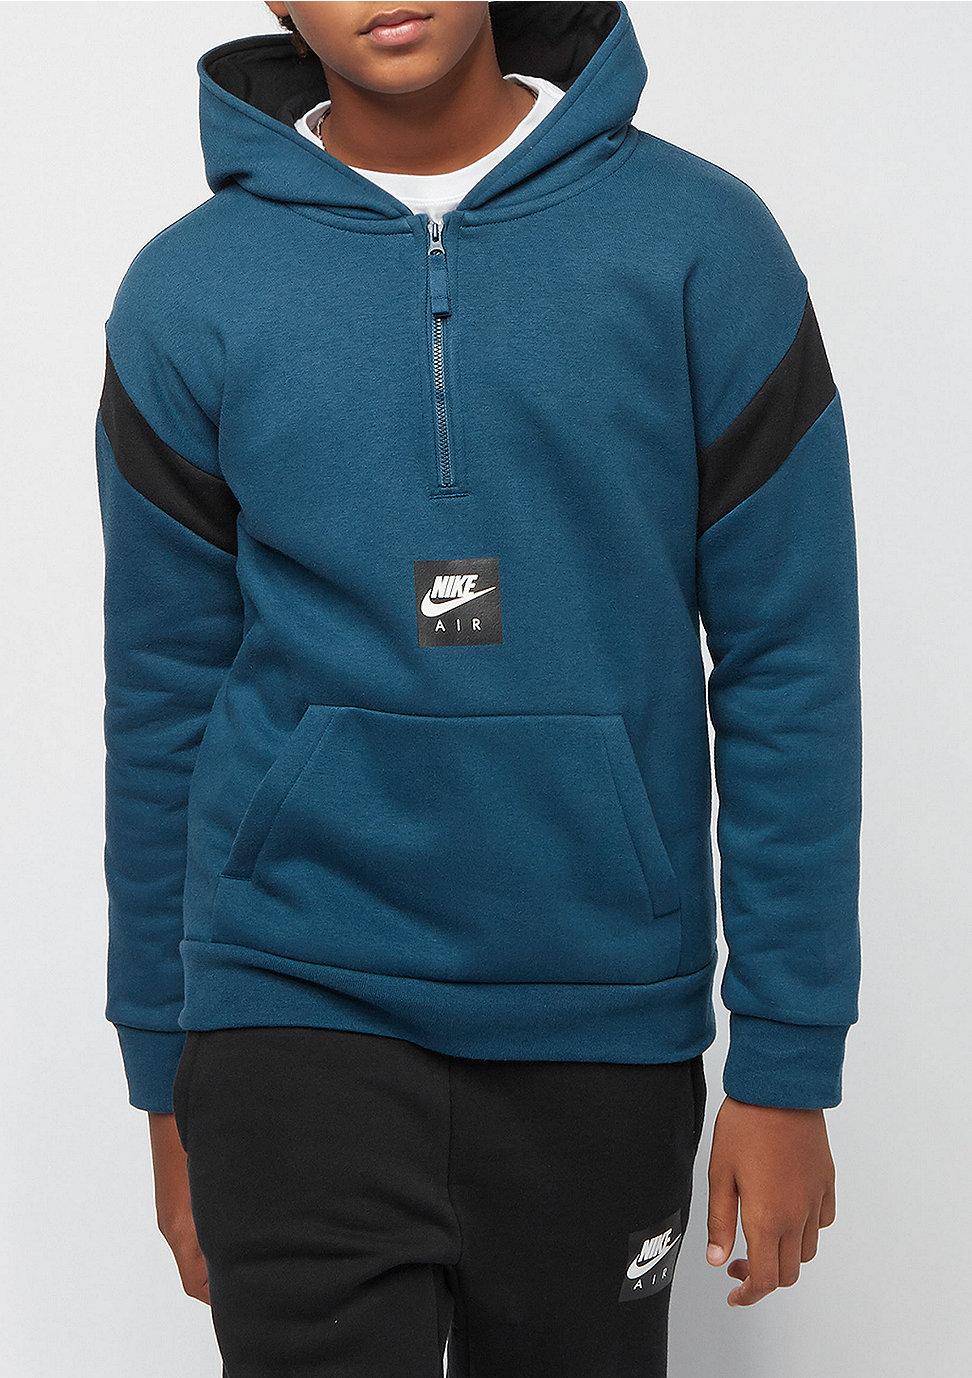 B Air Snipes Nk Nike Forceblack Po Bestellen Blue Junior Bei